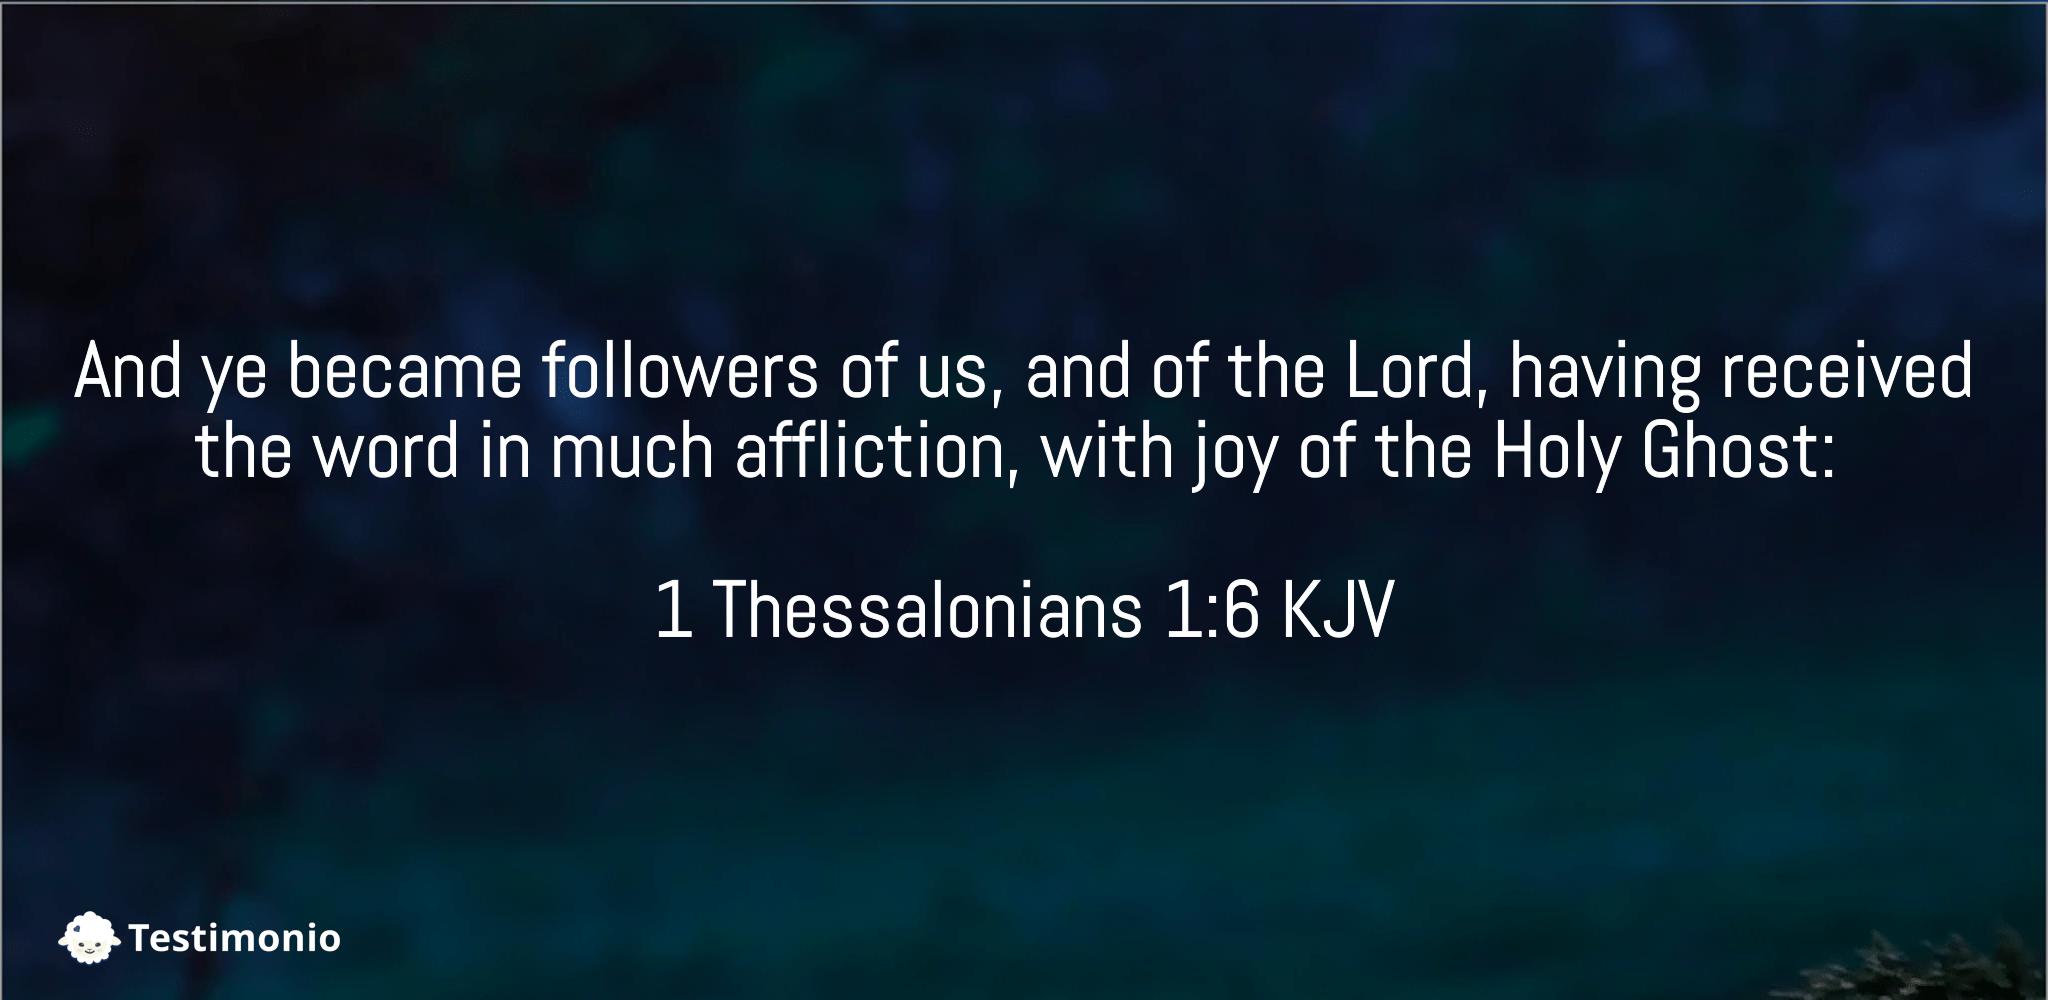 1 Thessalonians 1:6